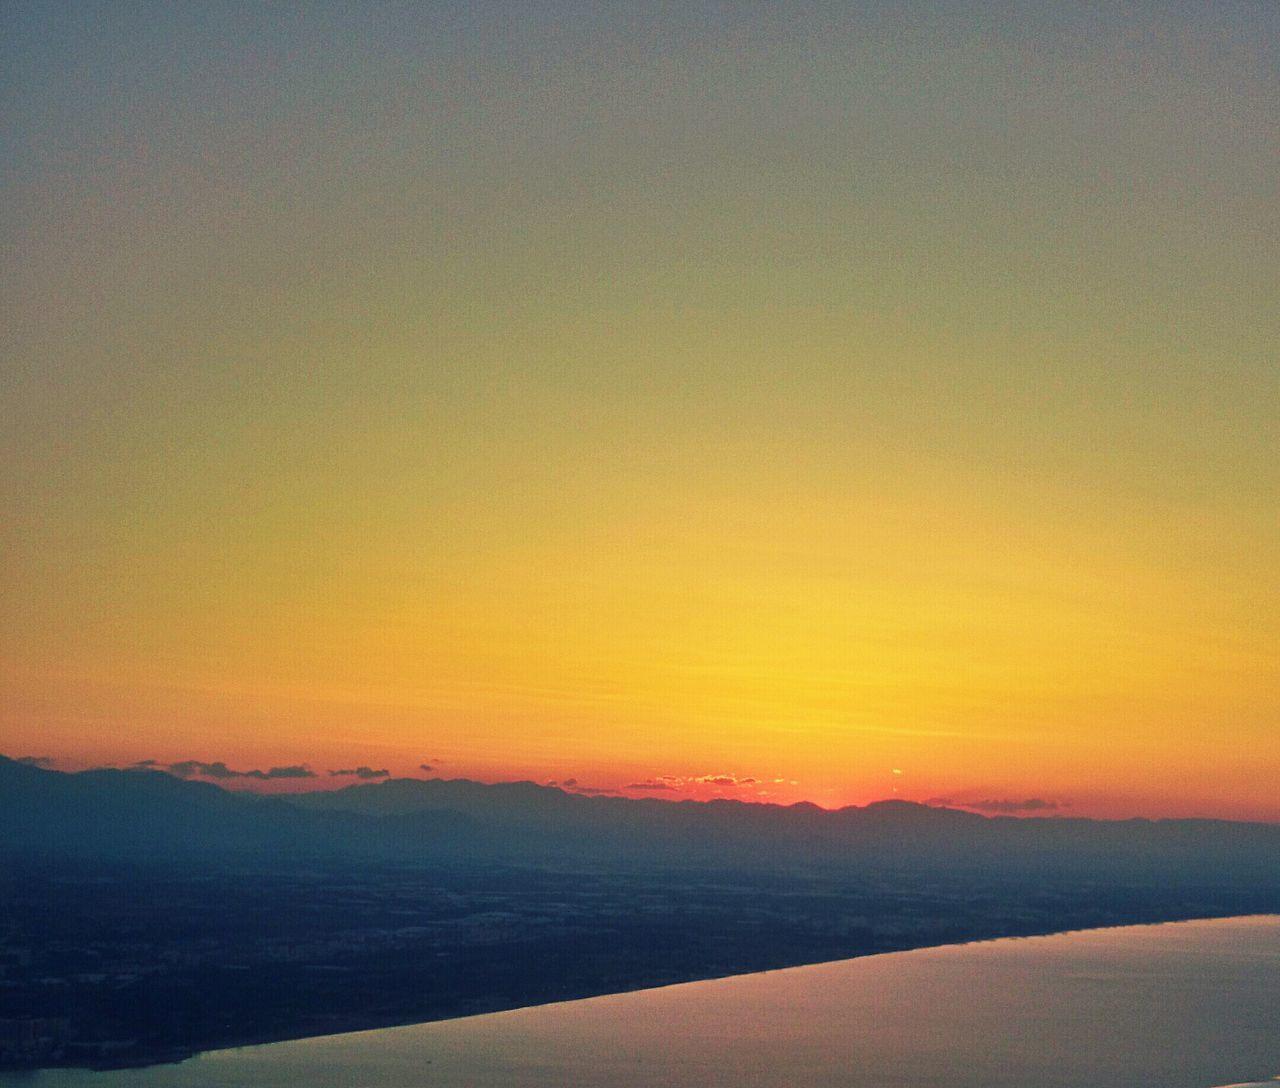 City On Sleep Sea On Sleep The Power Of Sun Warm Light Orange Yellow Blu Tranquility EyeEmNewHere Flying High